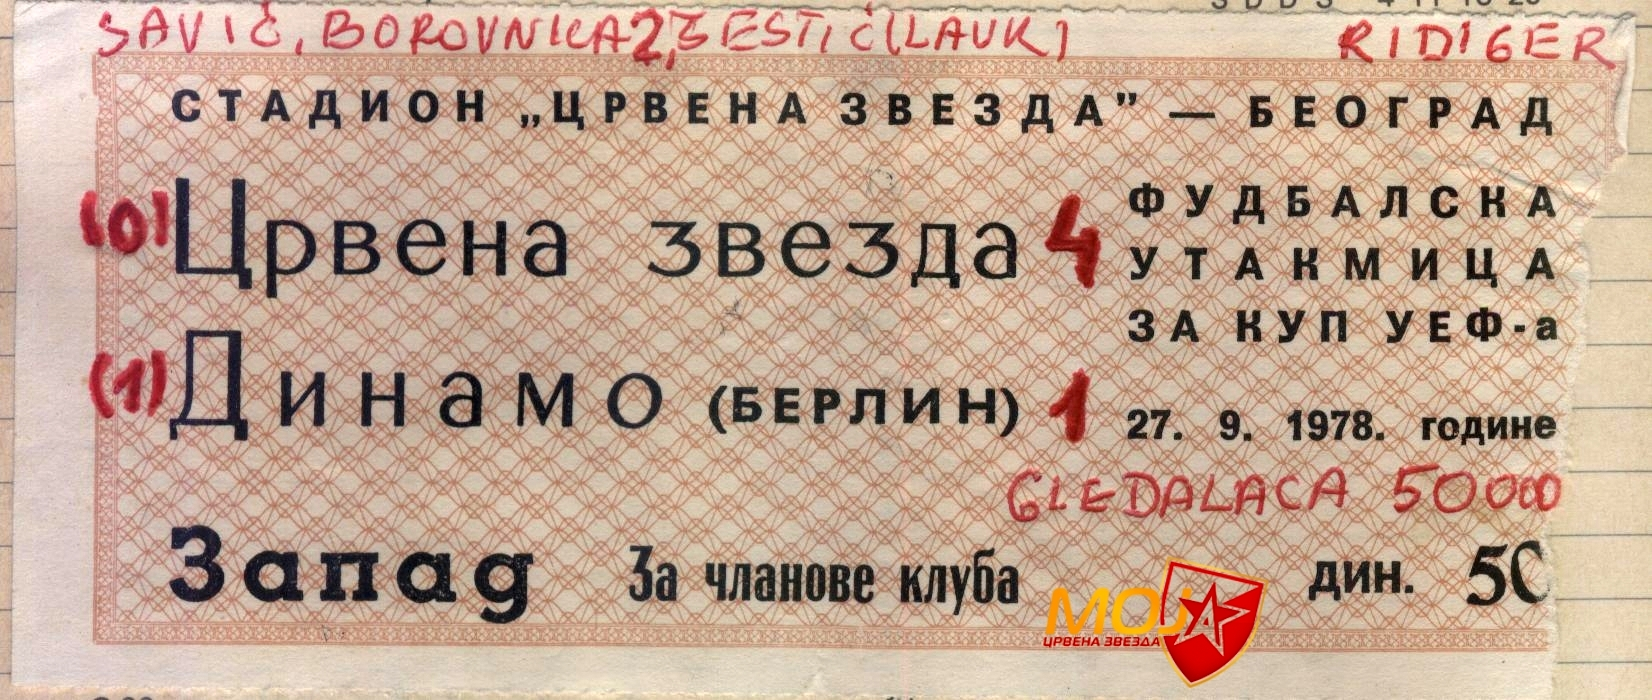 CZ-Din_B 4-1 1978